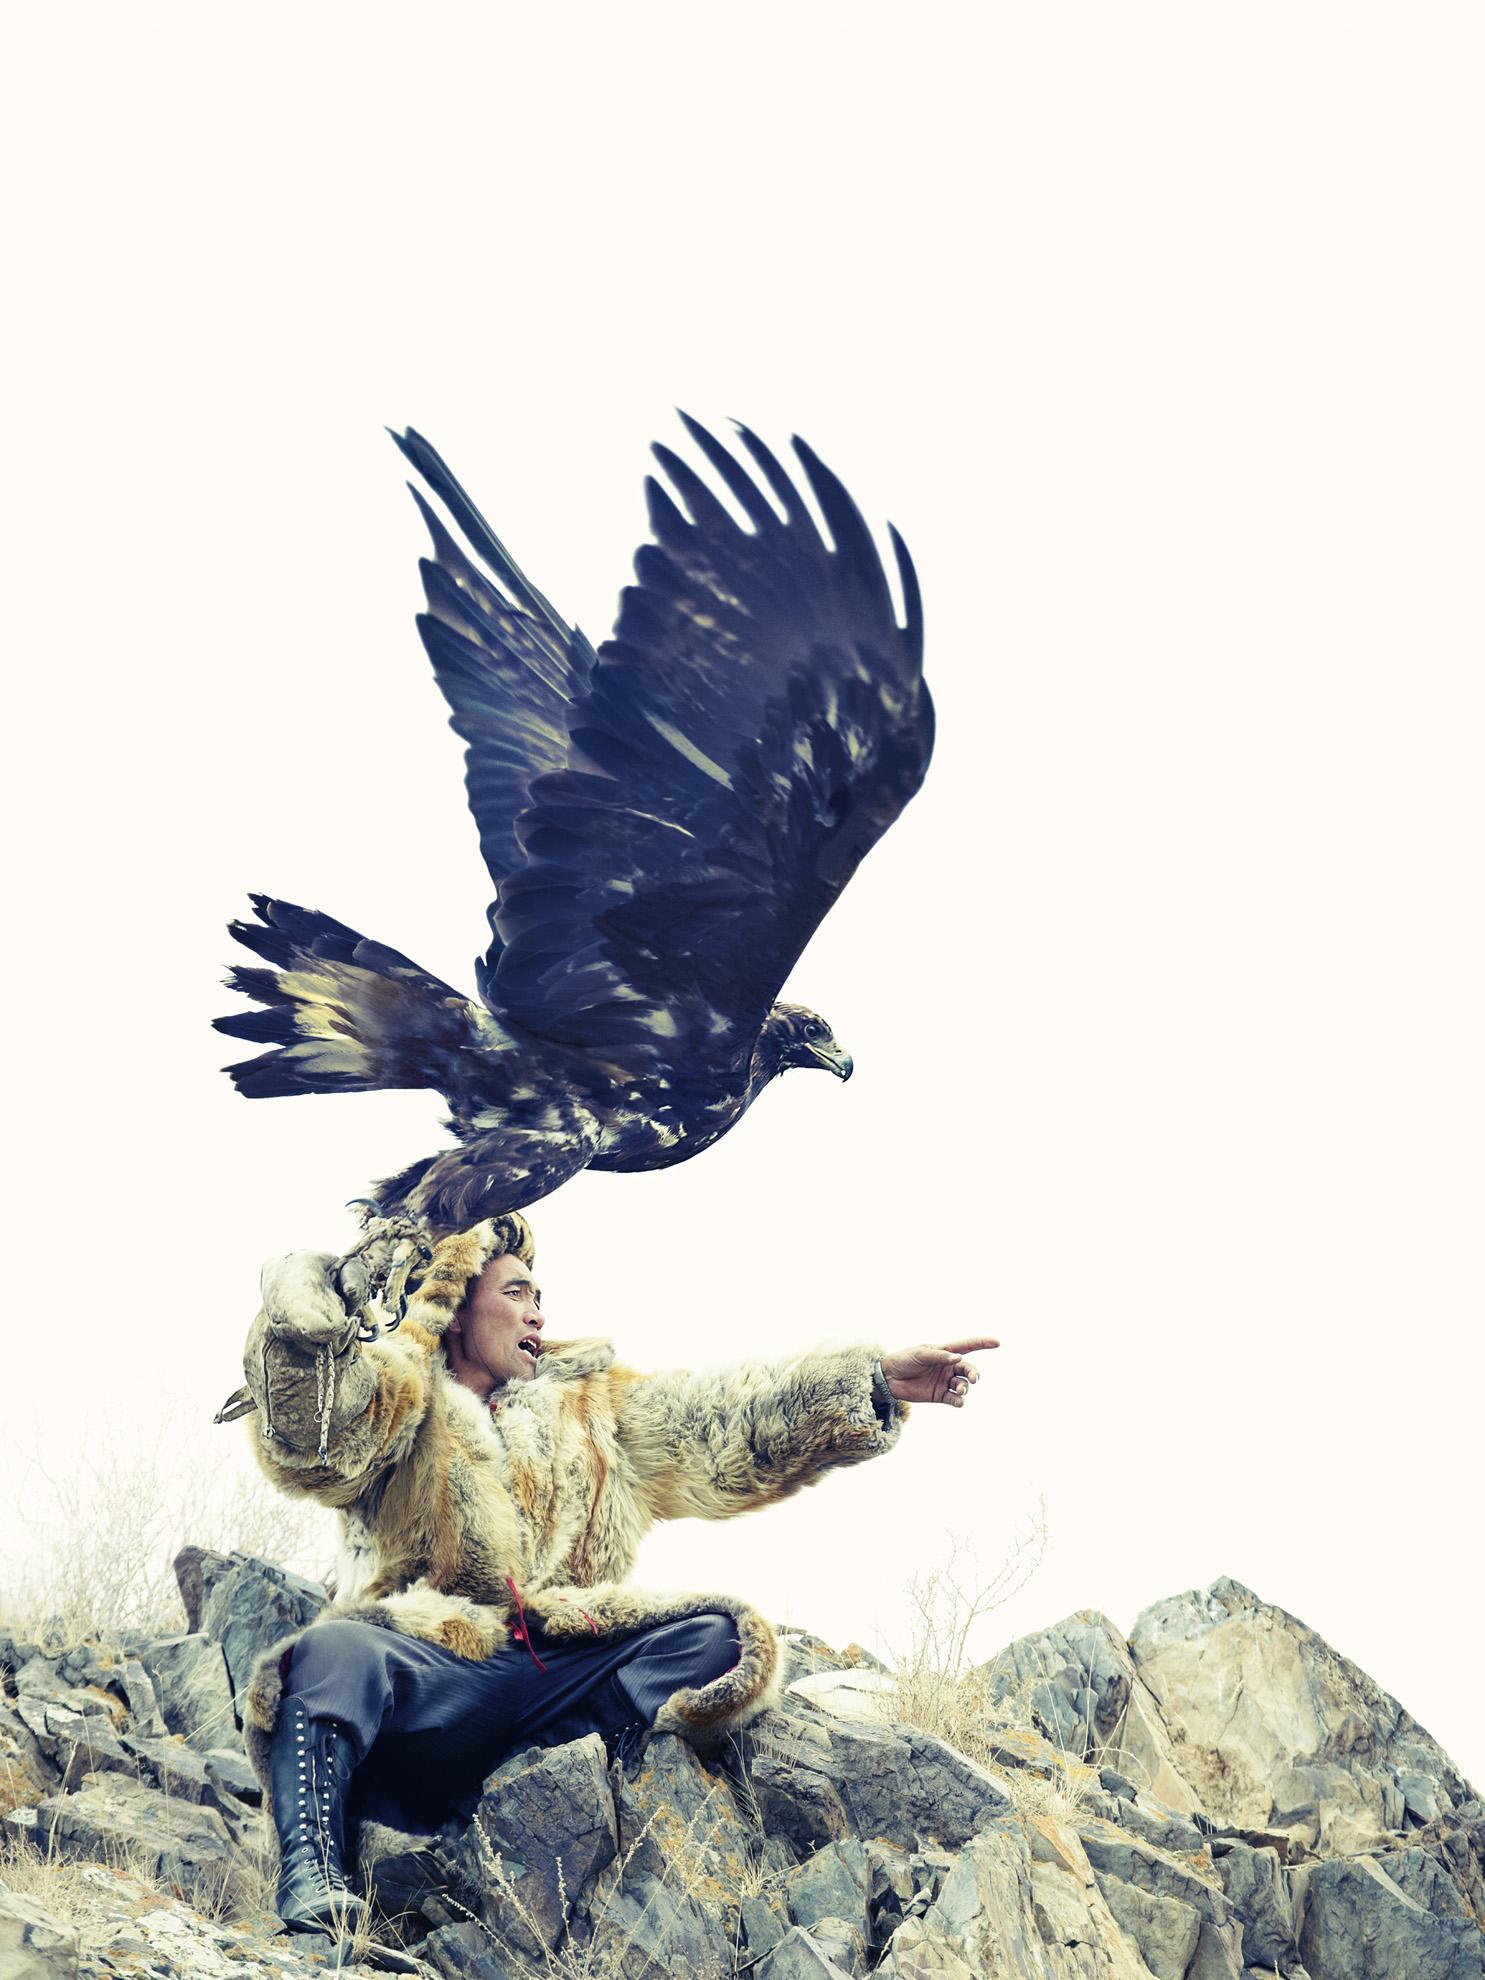 Medium_Owerko_Eagle Hunter print_16.jpg